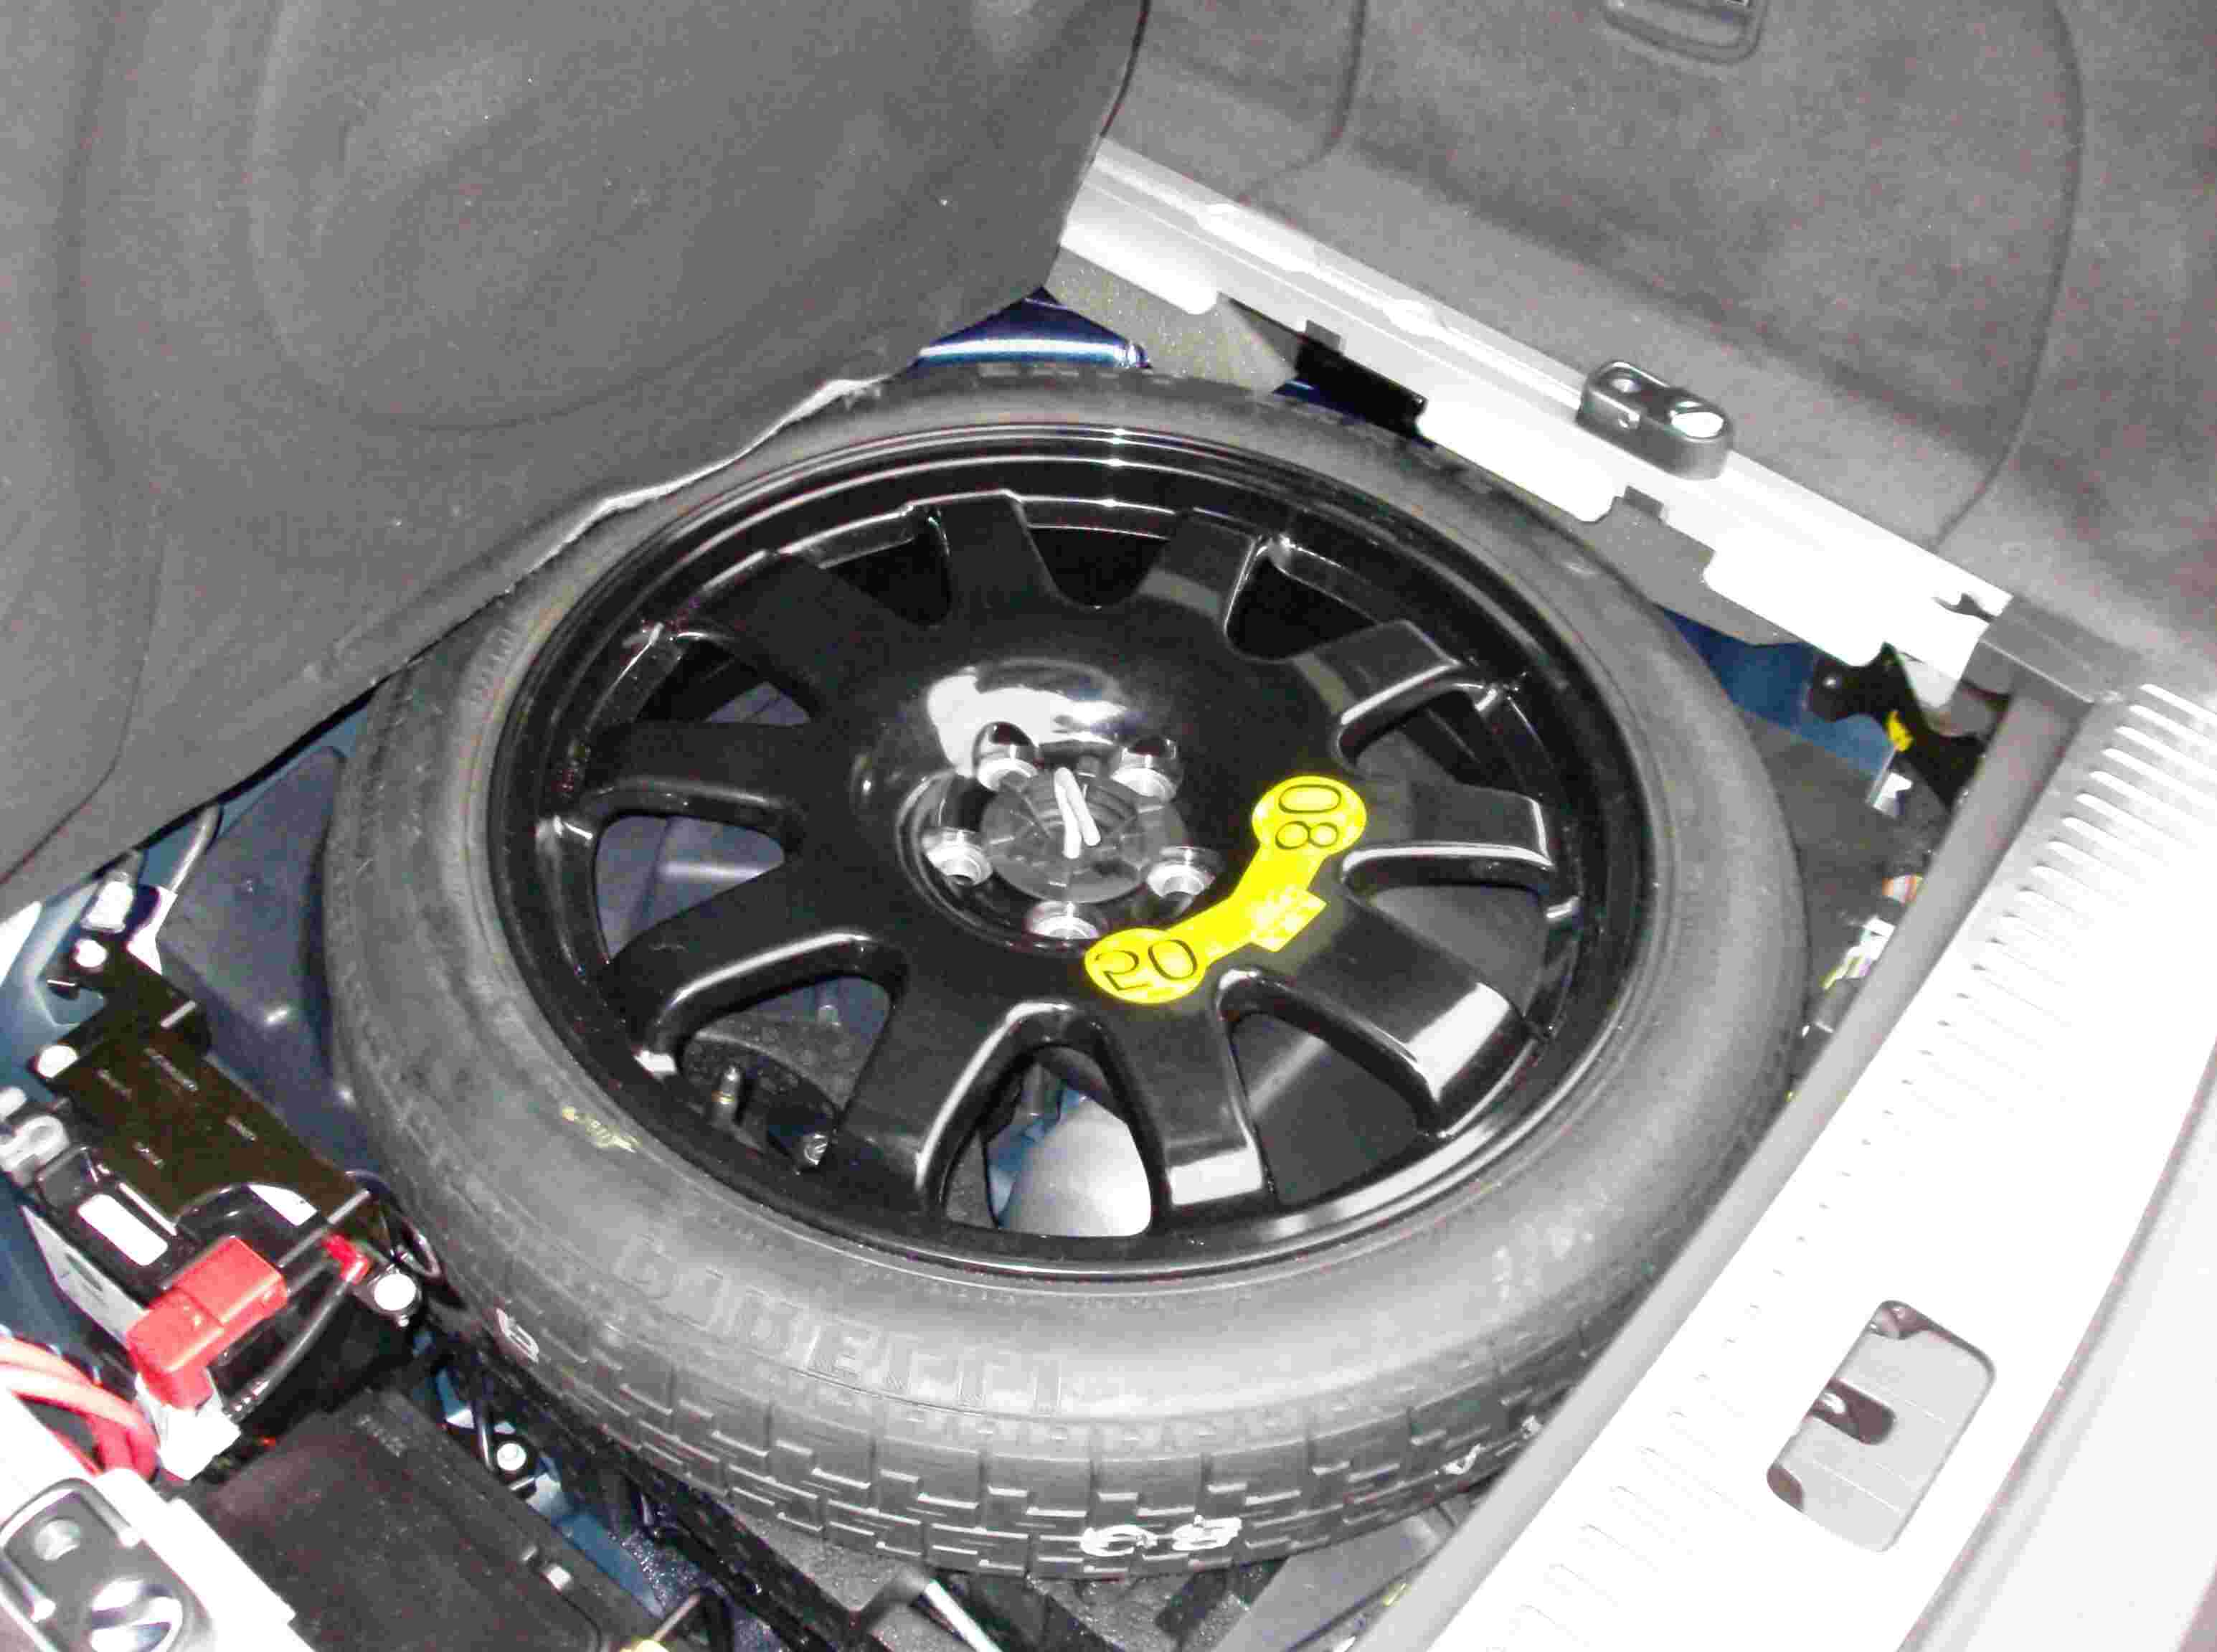 OZ6YA 4Ps Suitable for Ja-gu-ar 59mm wheel cover AGUAR XF XJL XK X-TYPE tire Ja-gu-ar wheel center cover black